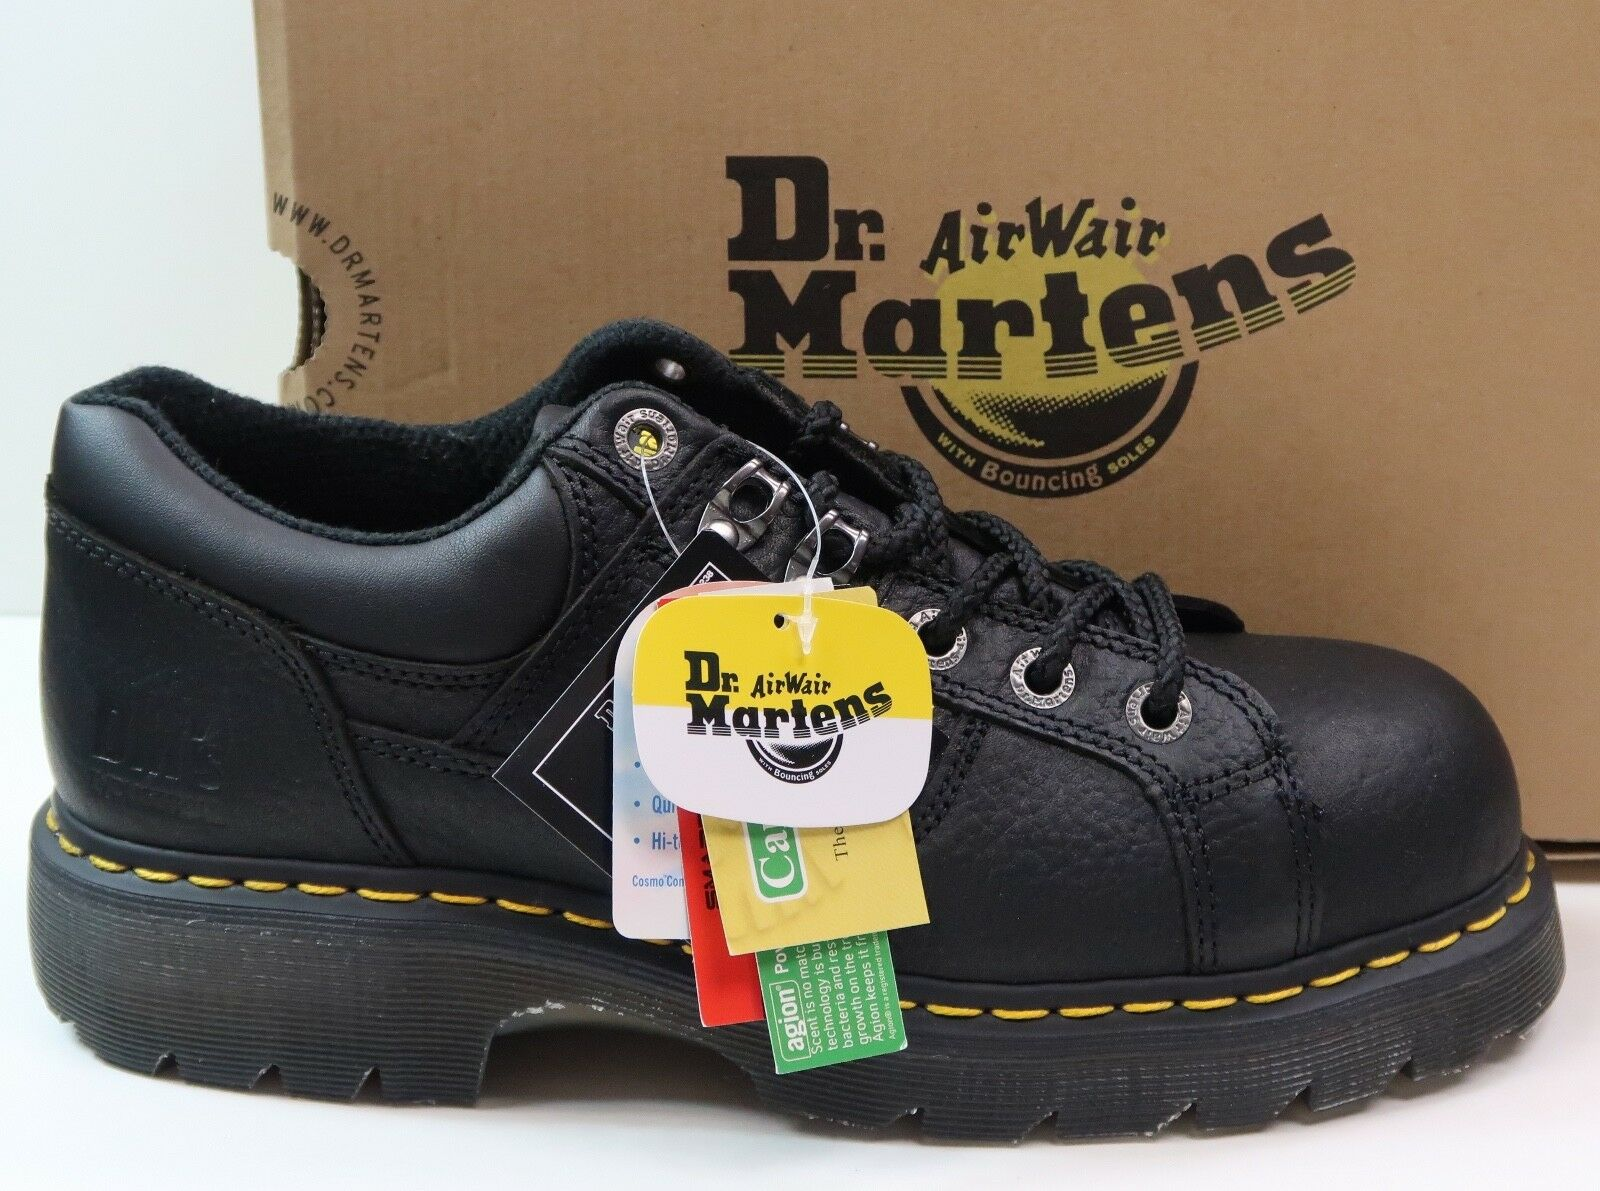 Dr. Martens Gunby ST Steel Toe Heritage Industrial Work Black shoes Brand New